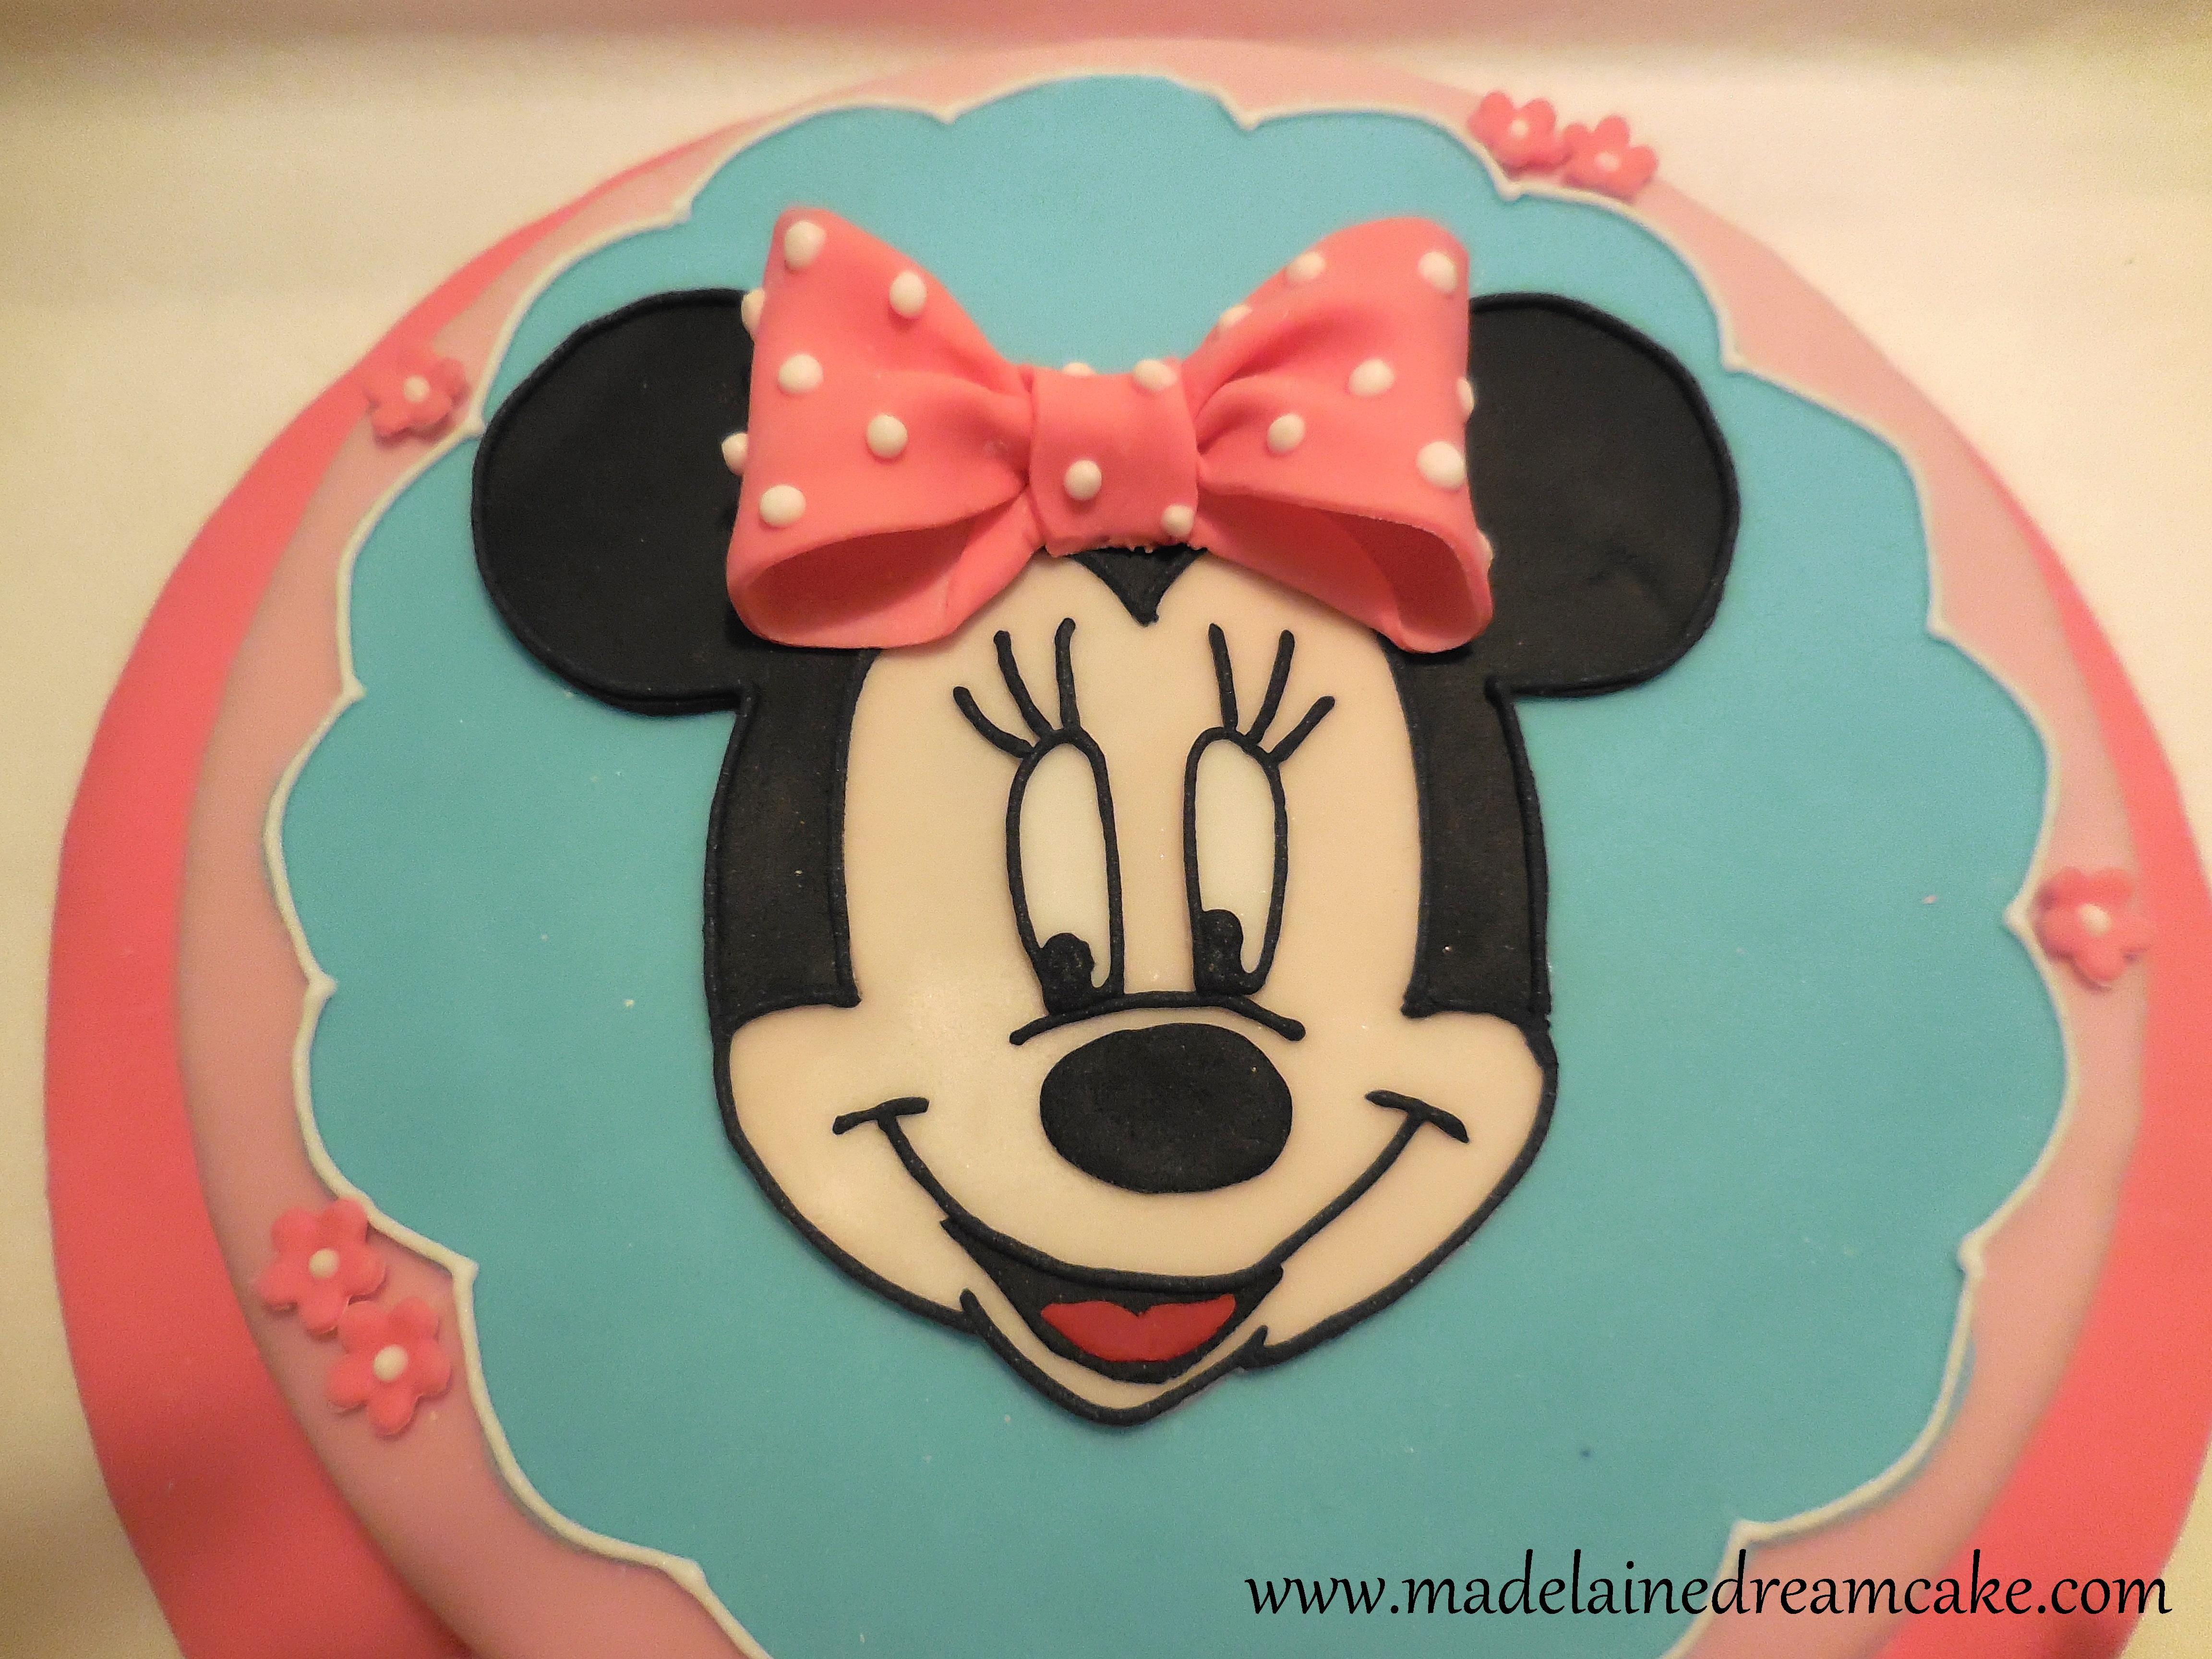 Mini Maus Torte  Madelainedreamcake